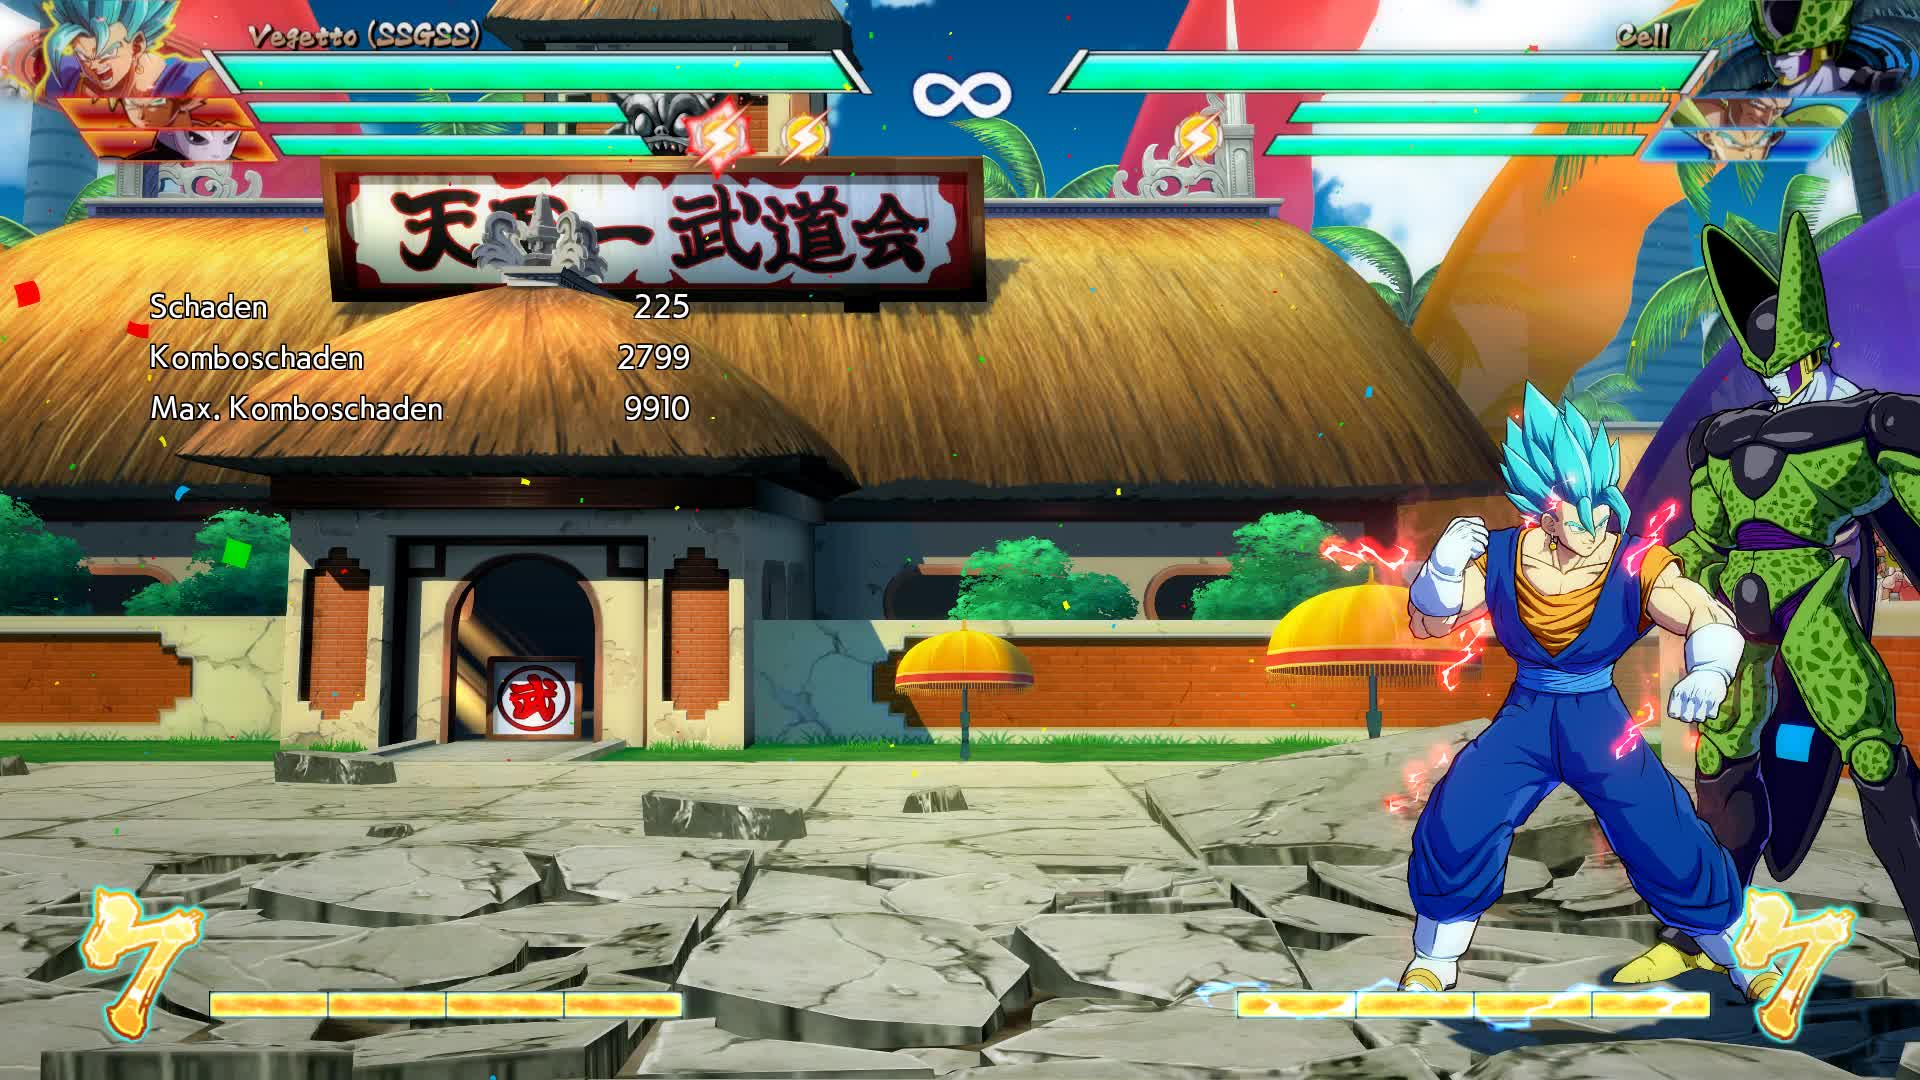 Dragon Ball FighterZ, dbfz, DRAGON BALL FighterZ 2019.04.23 - 16.15.36.04 GIFs